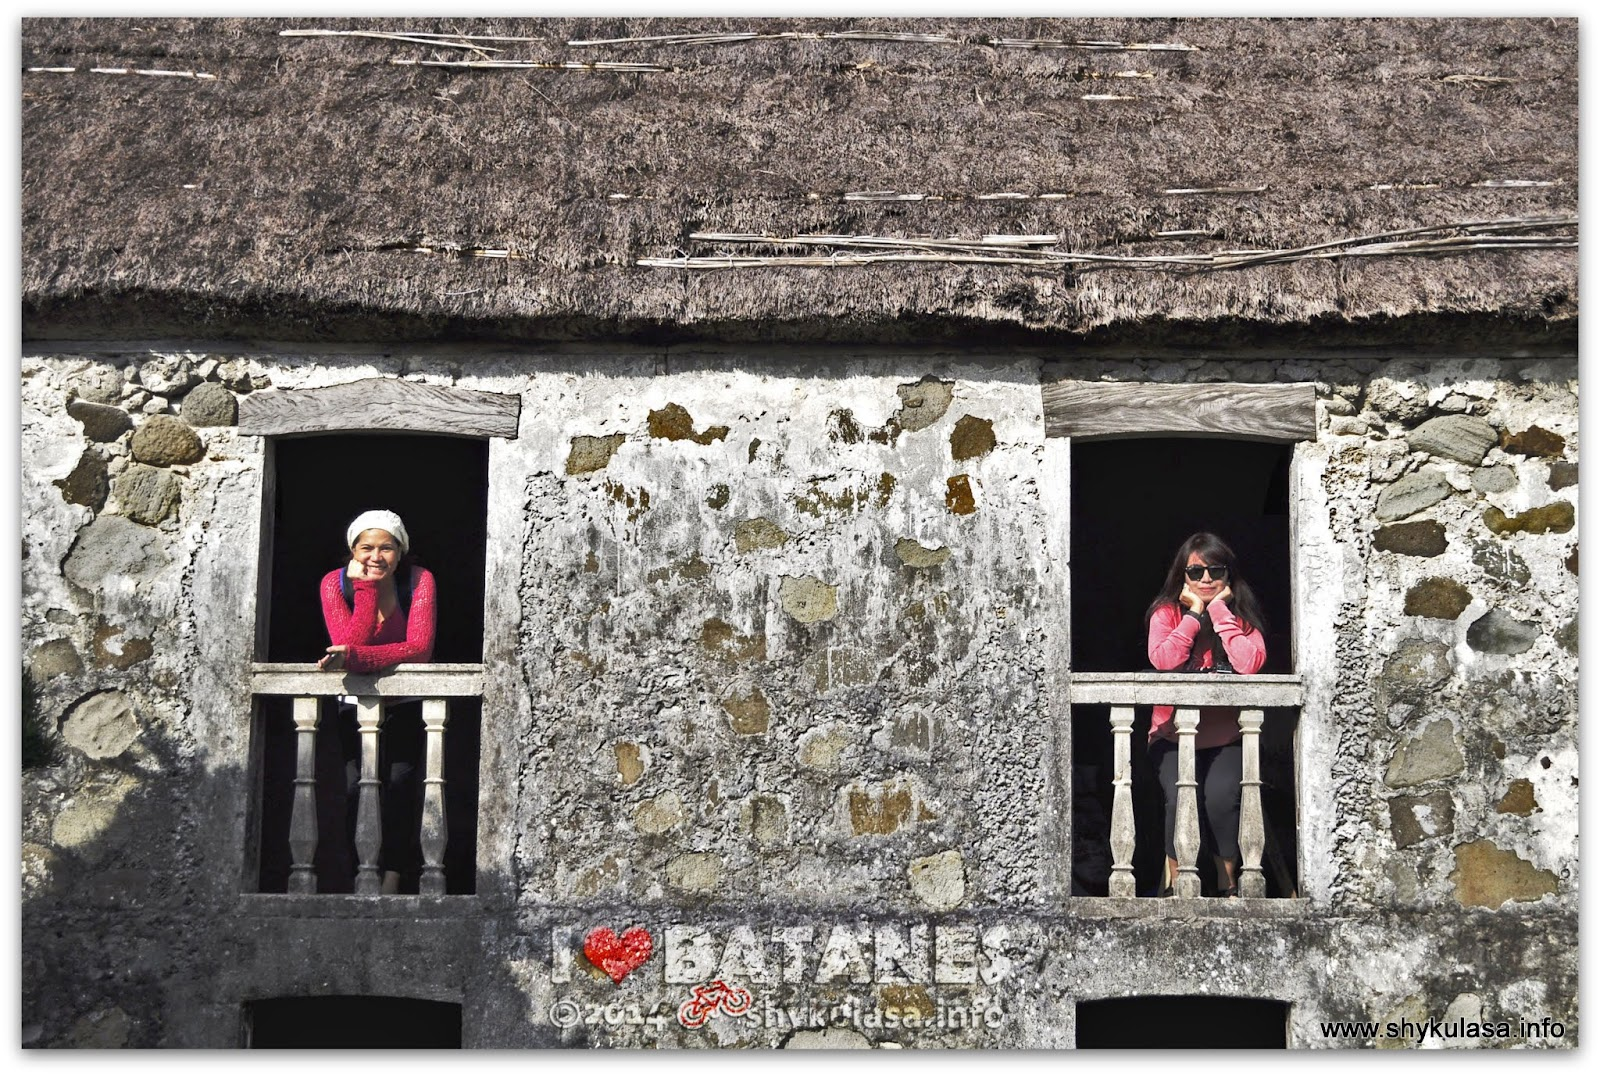 Old Beaterio at Savidug, Sabtang, Batanes